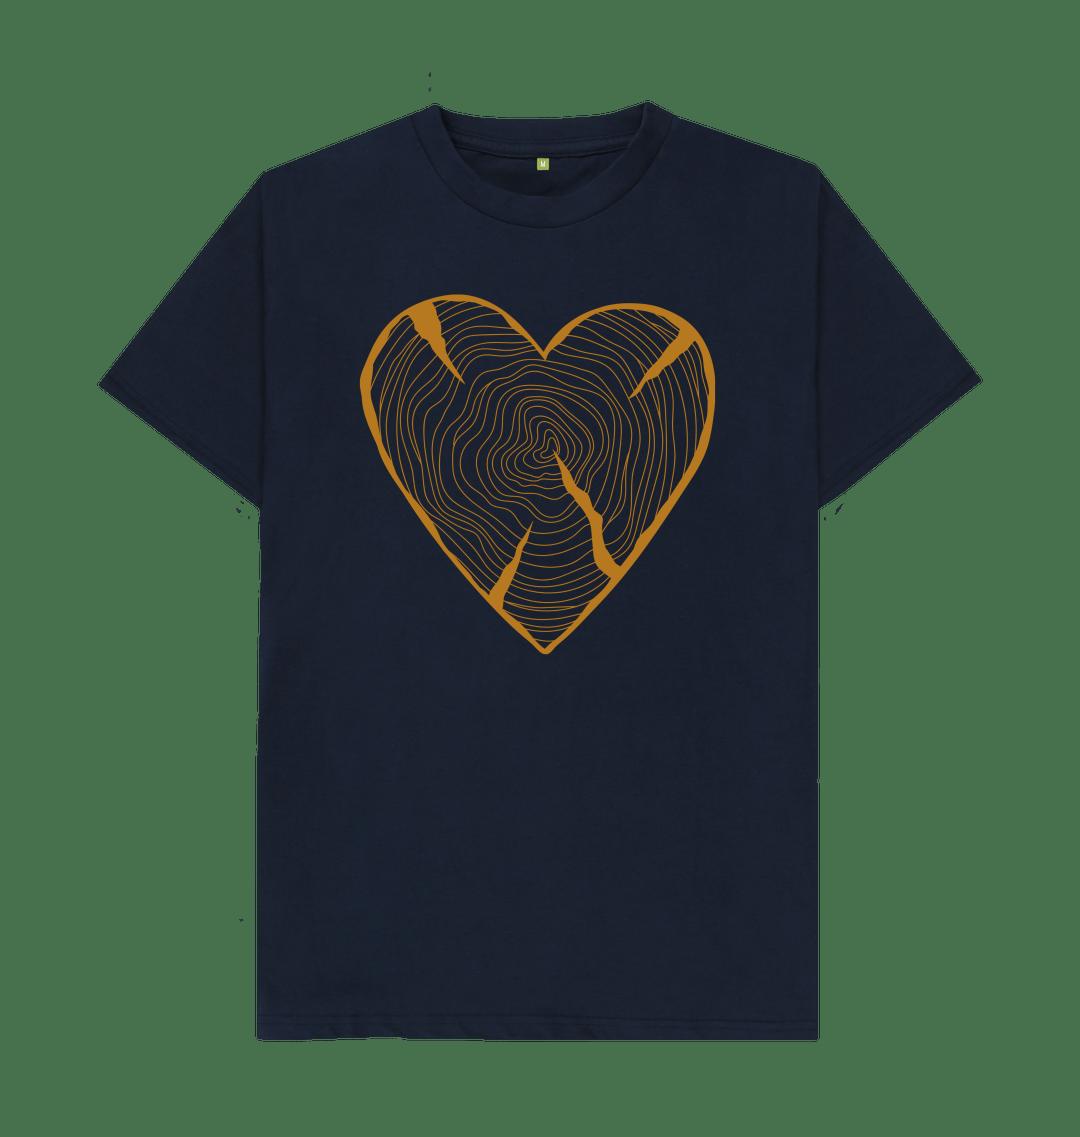 Unisex NATURE HEART ADVENTURE Organic Cotton T-shirt navy blue